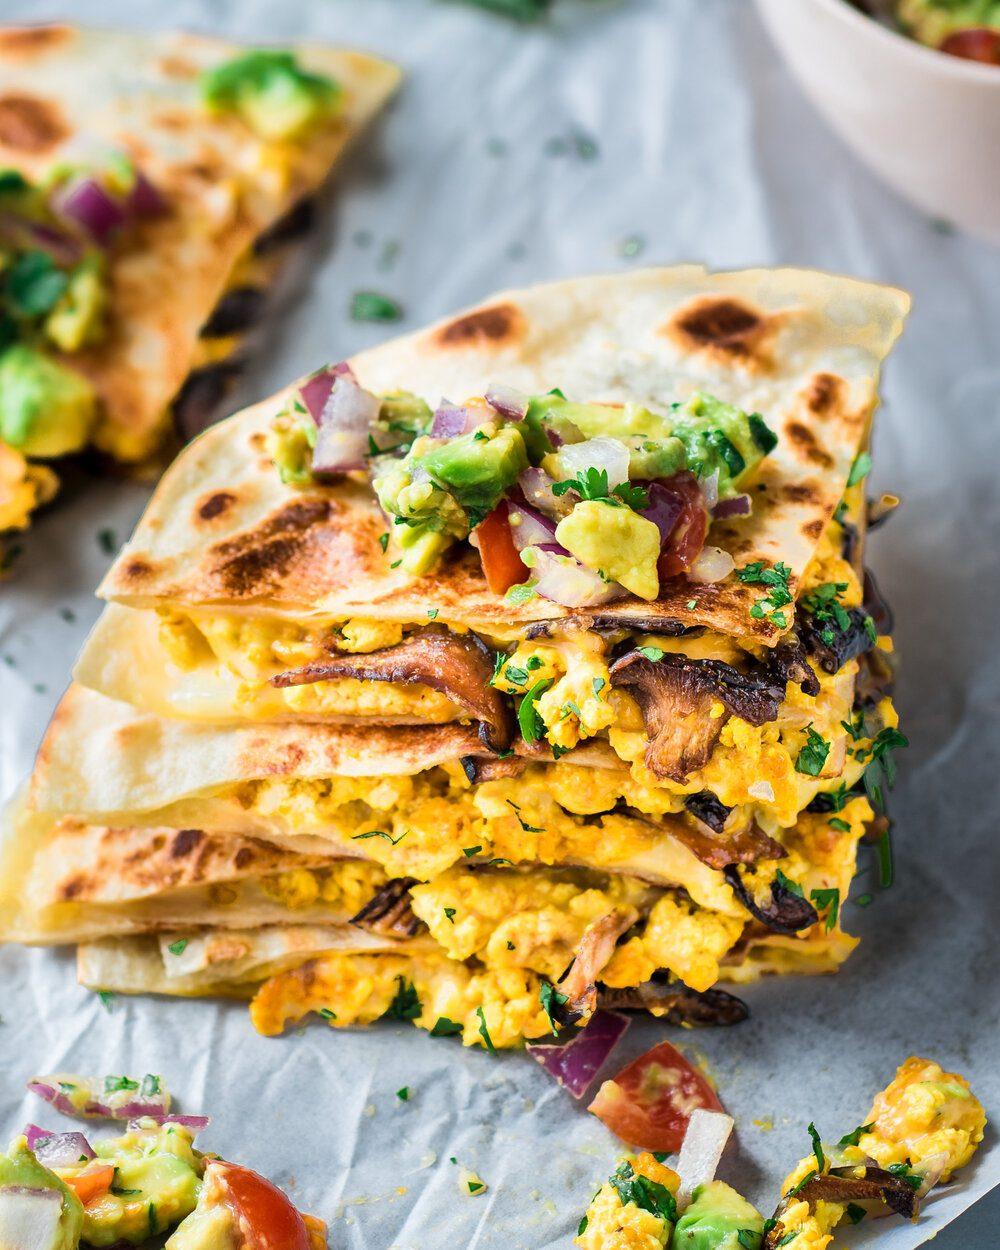 25 Easy Kid-Friendly Vegan Recipes. Vegan Quesadillas with Mushroom Bacon.